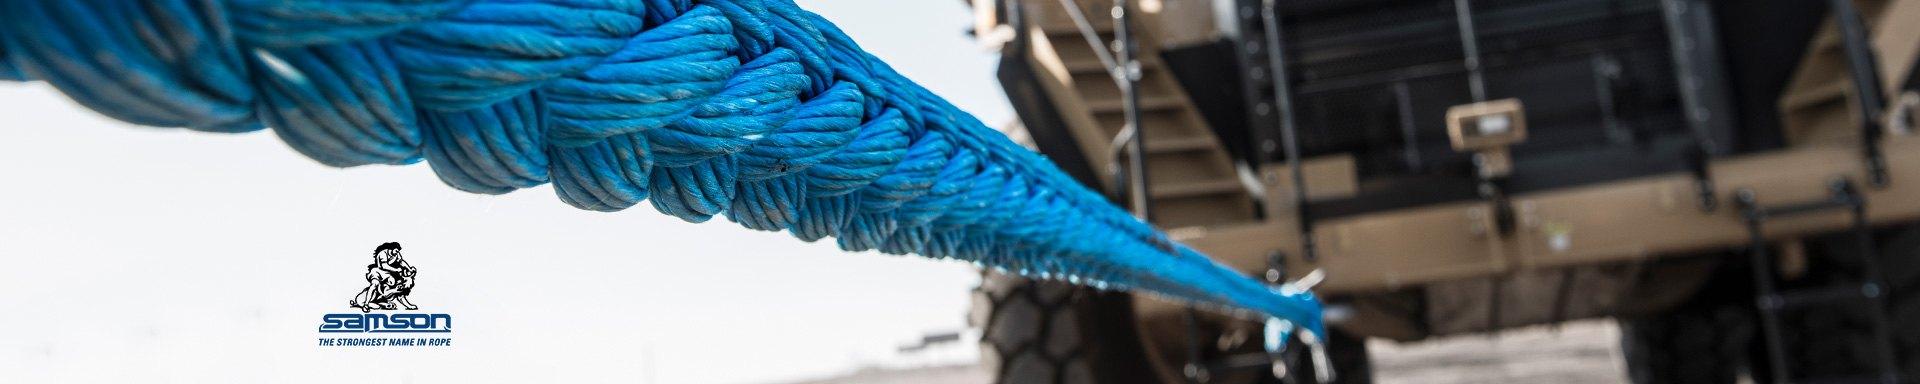 "Samson rope 5//8/"" 150ft slightly used Blue rope."